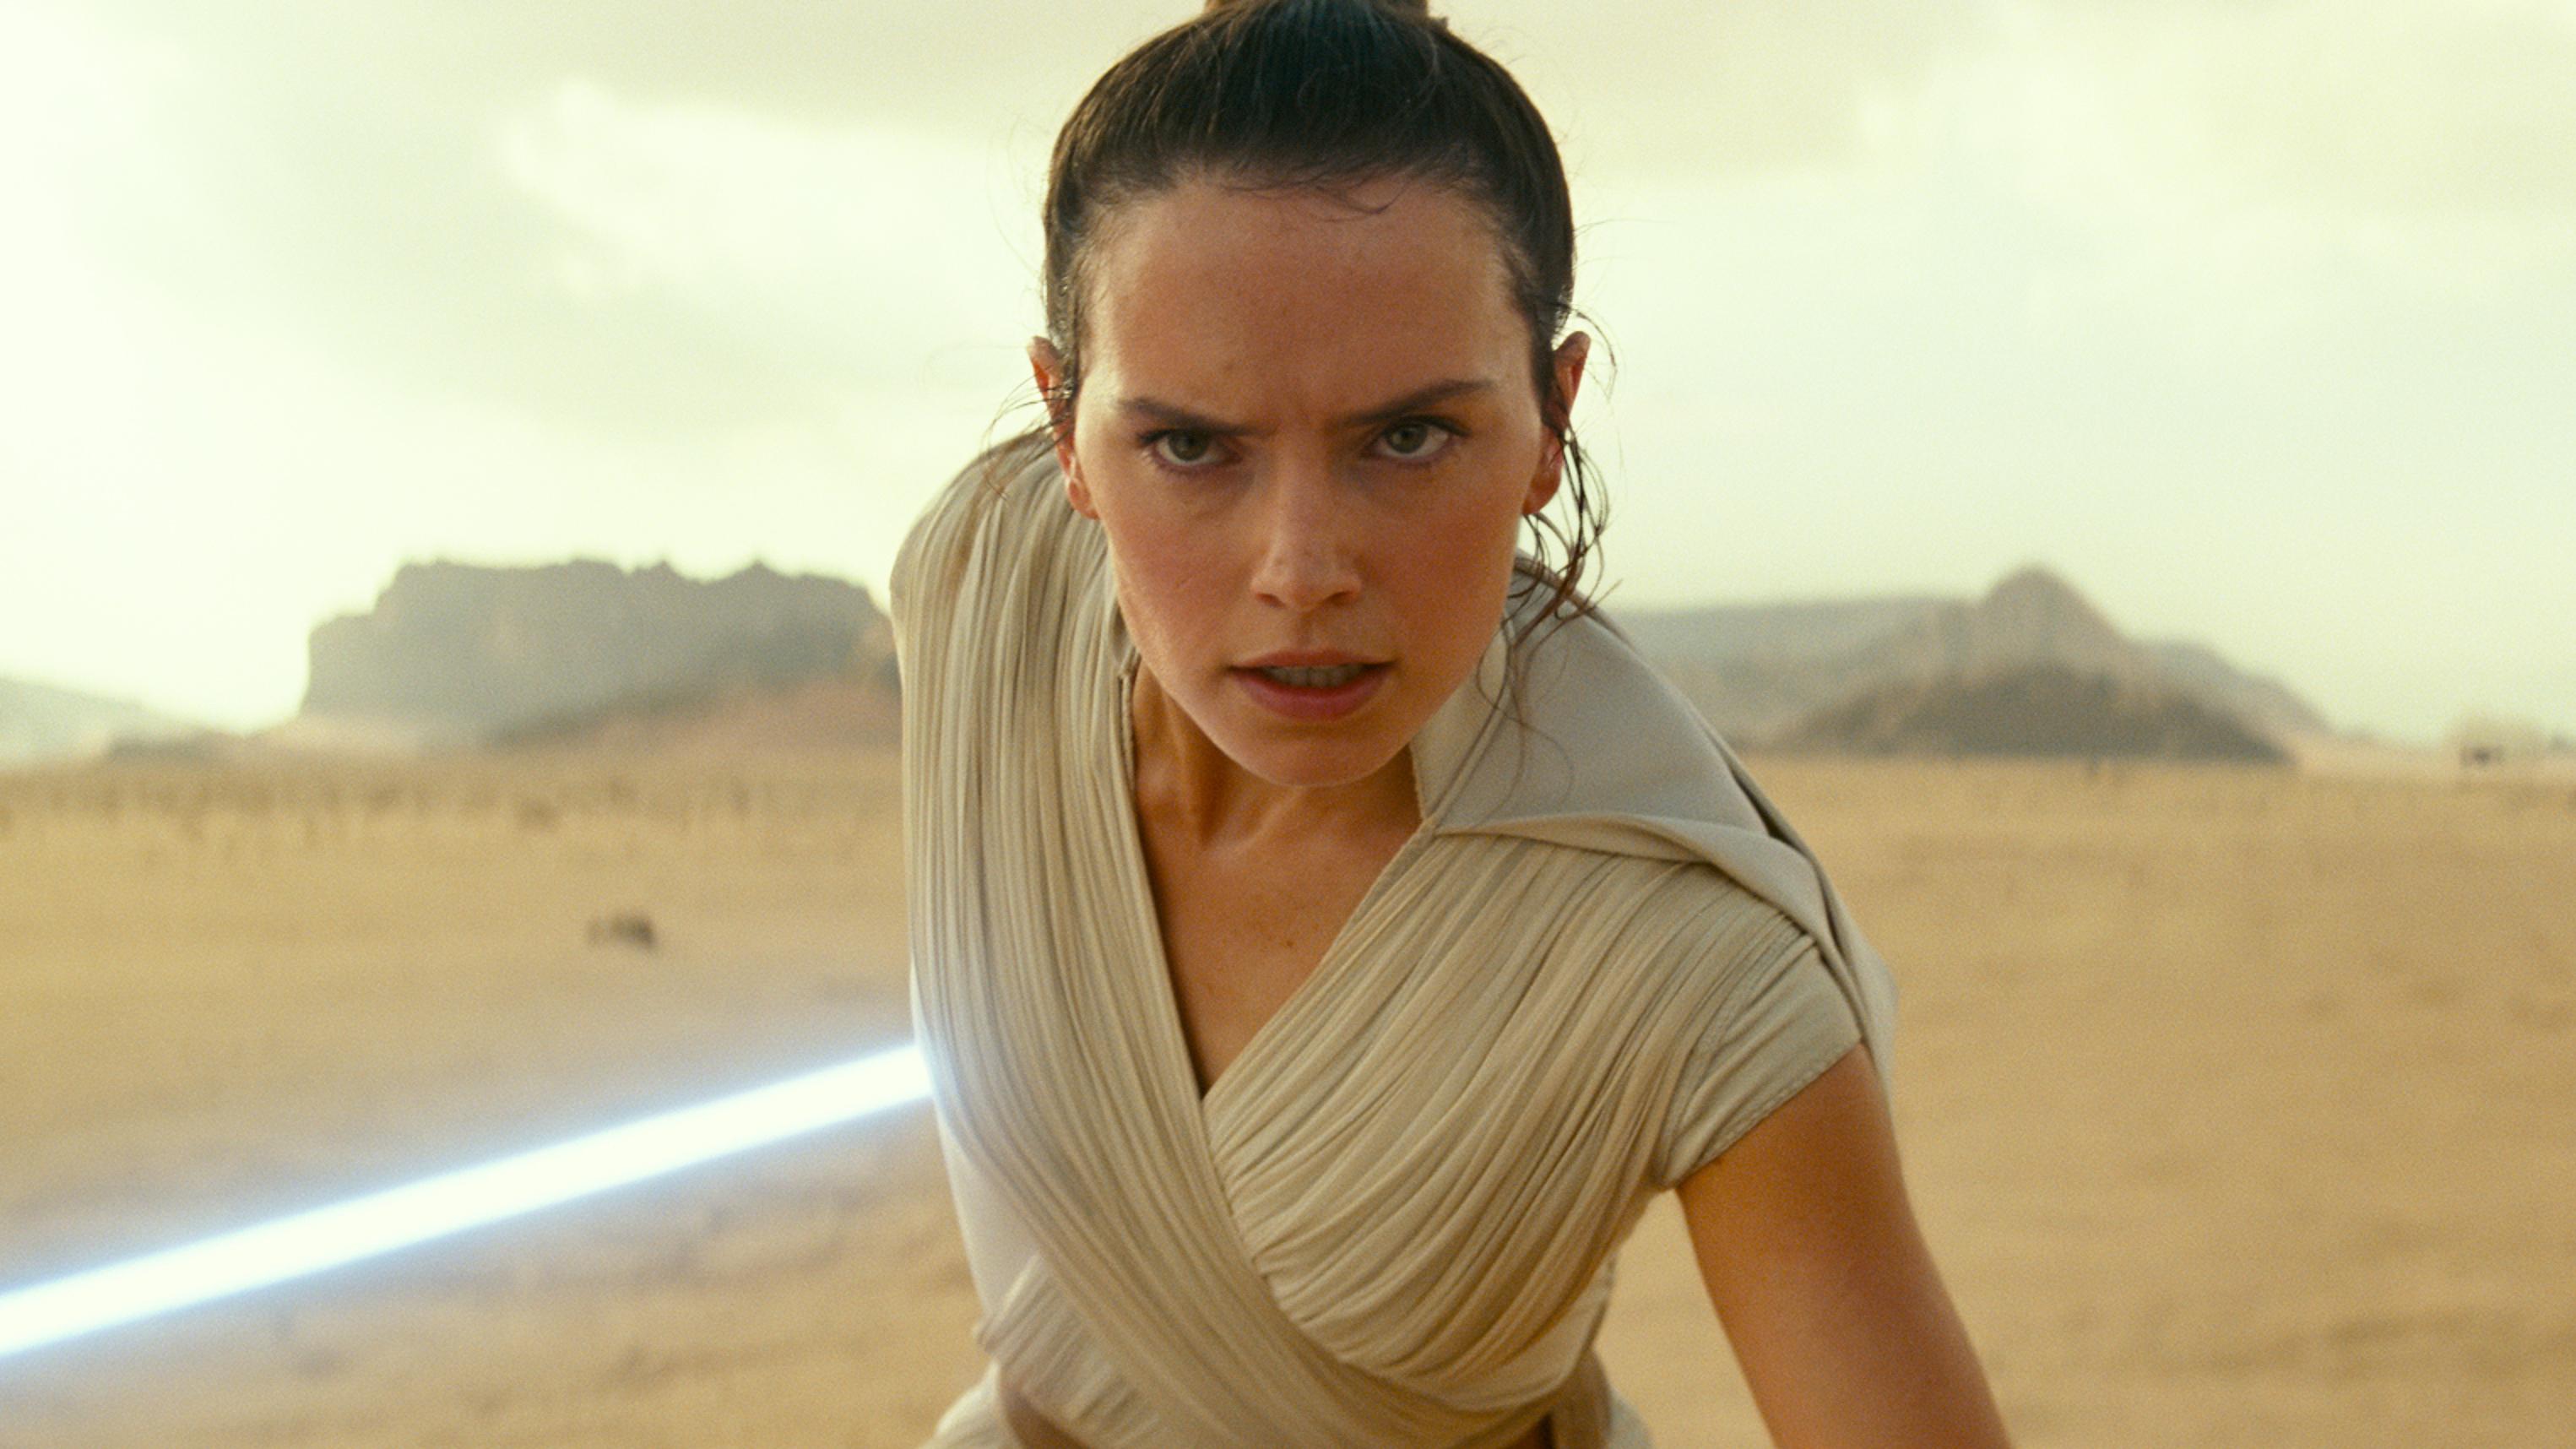 When Will Star Wars: The Rise of Skywalker Release on Disney+?